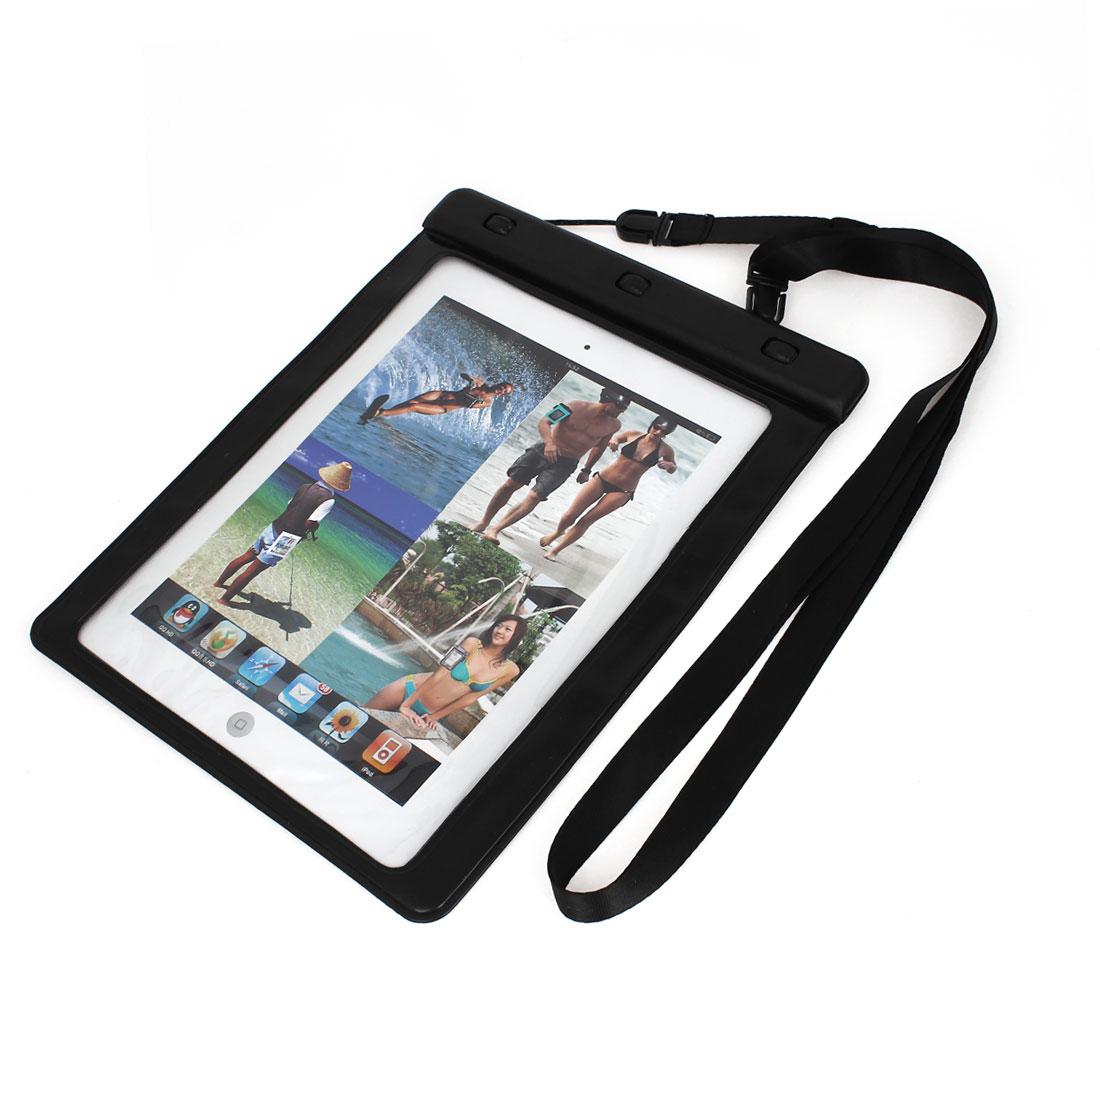 Plastic PVC Tablet Waterproof Bag Skin Cover Black for iPad Mini